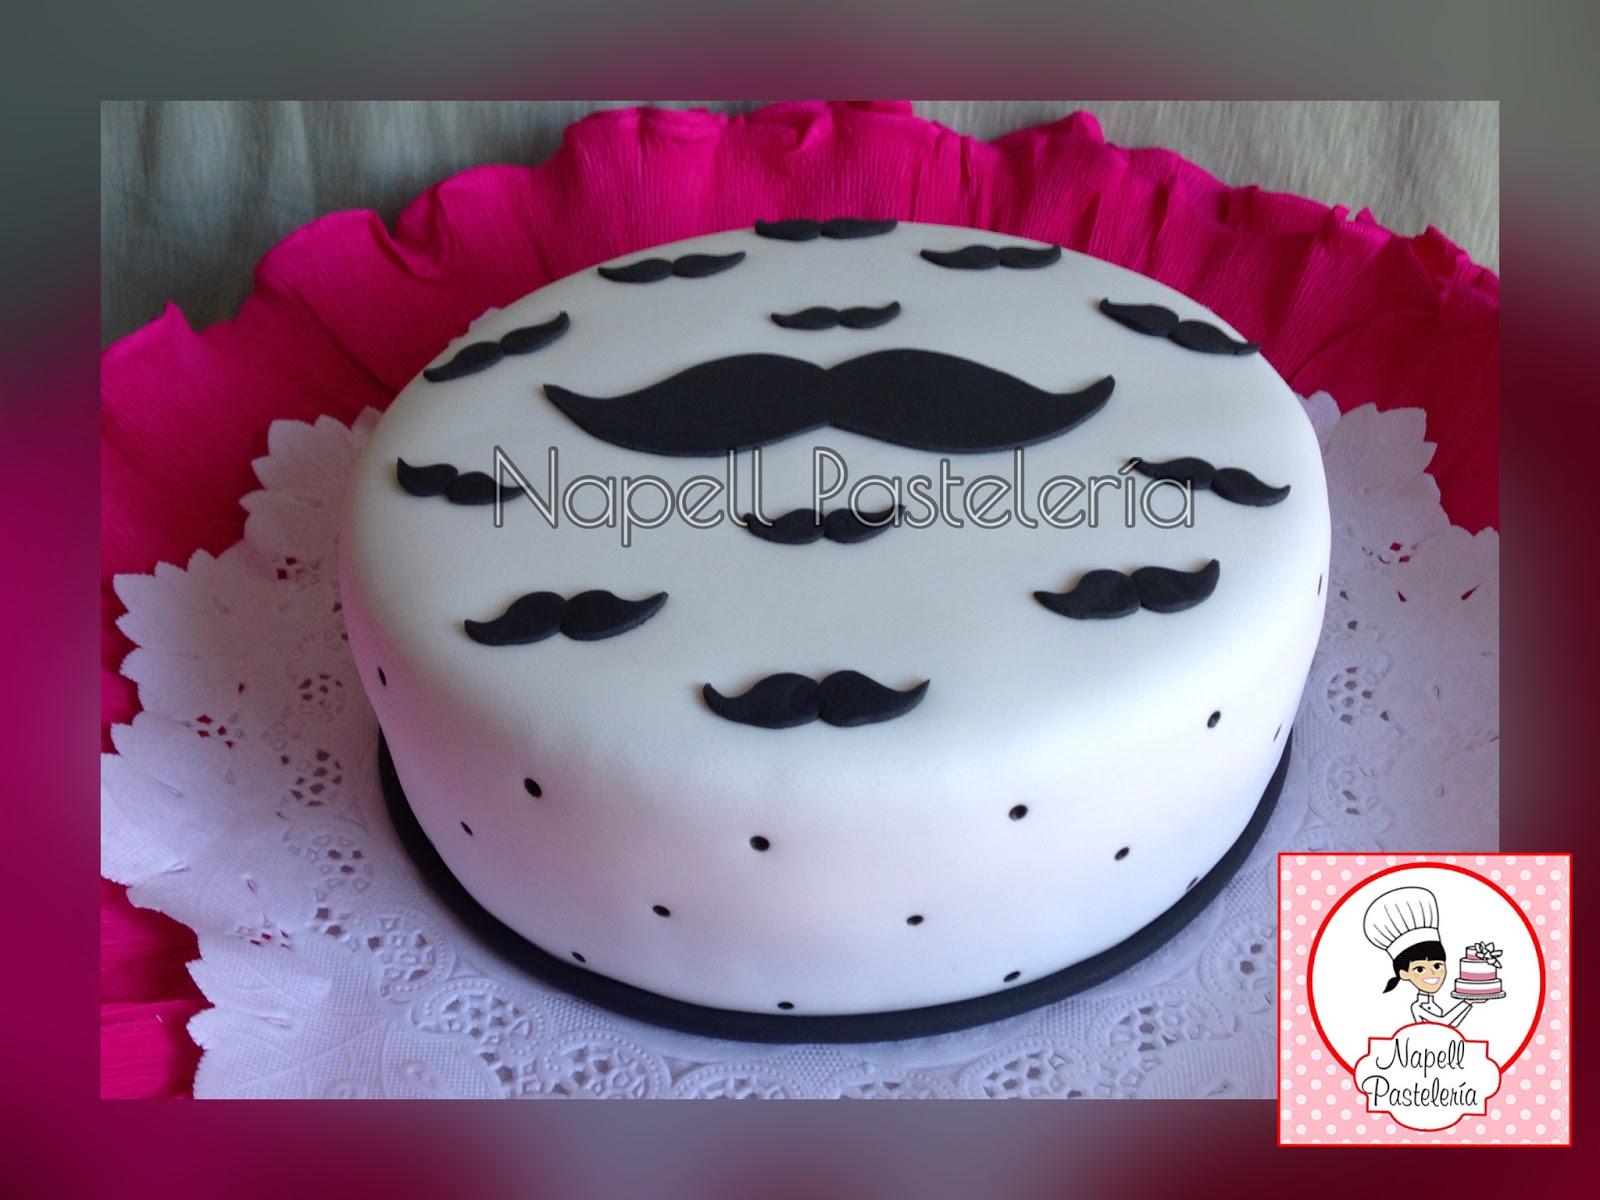 Napell pasteleria tortas decoradas for Buscar decoraciones